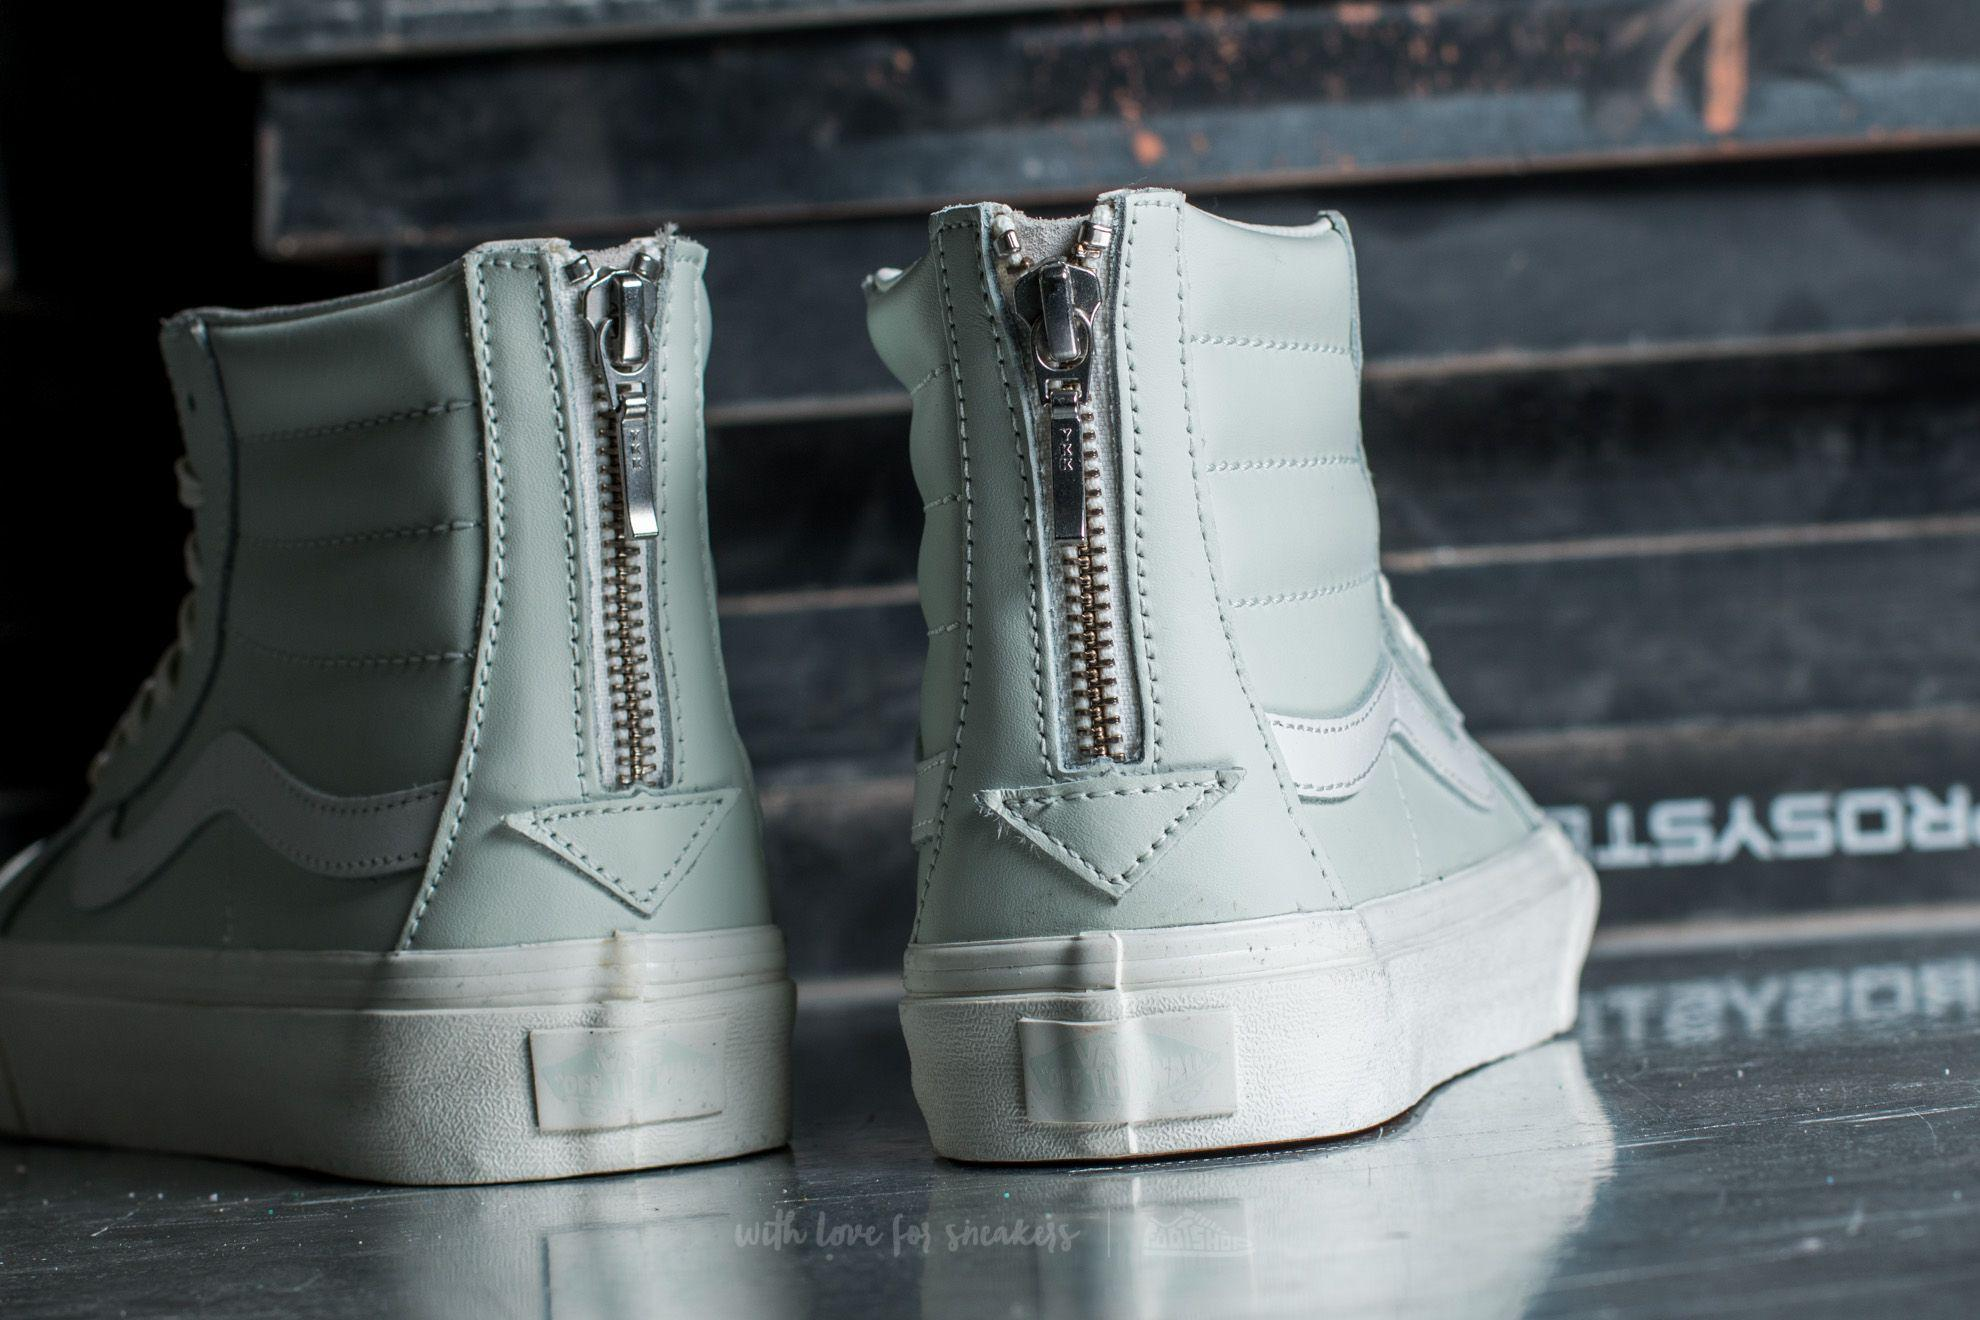 1a563c2cb1 Lyst - Vans Sk8-hi Slim Zip Leather Zephyr Blue  Blanc De Blanc in Blue